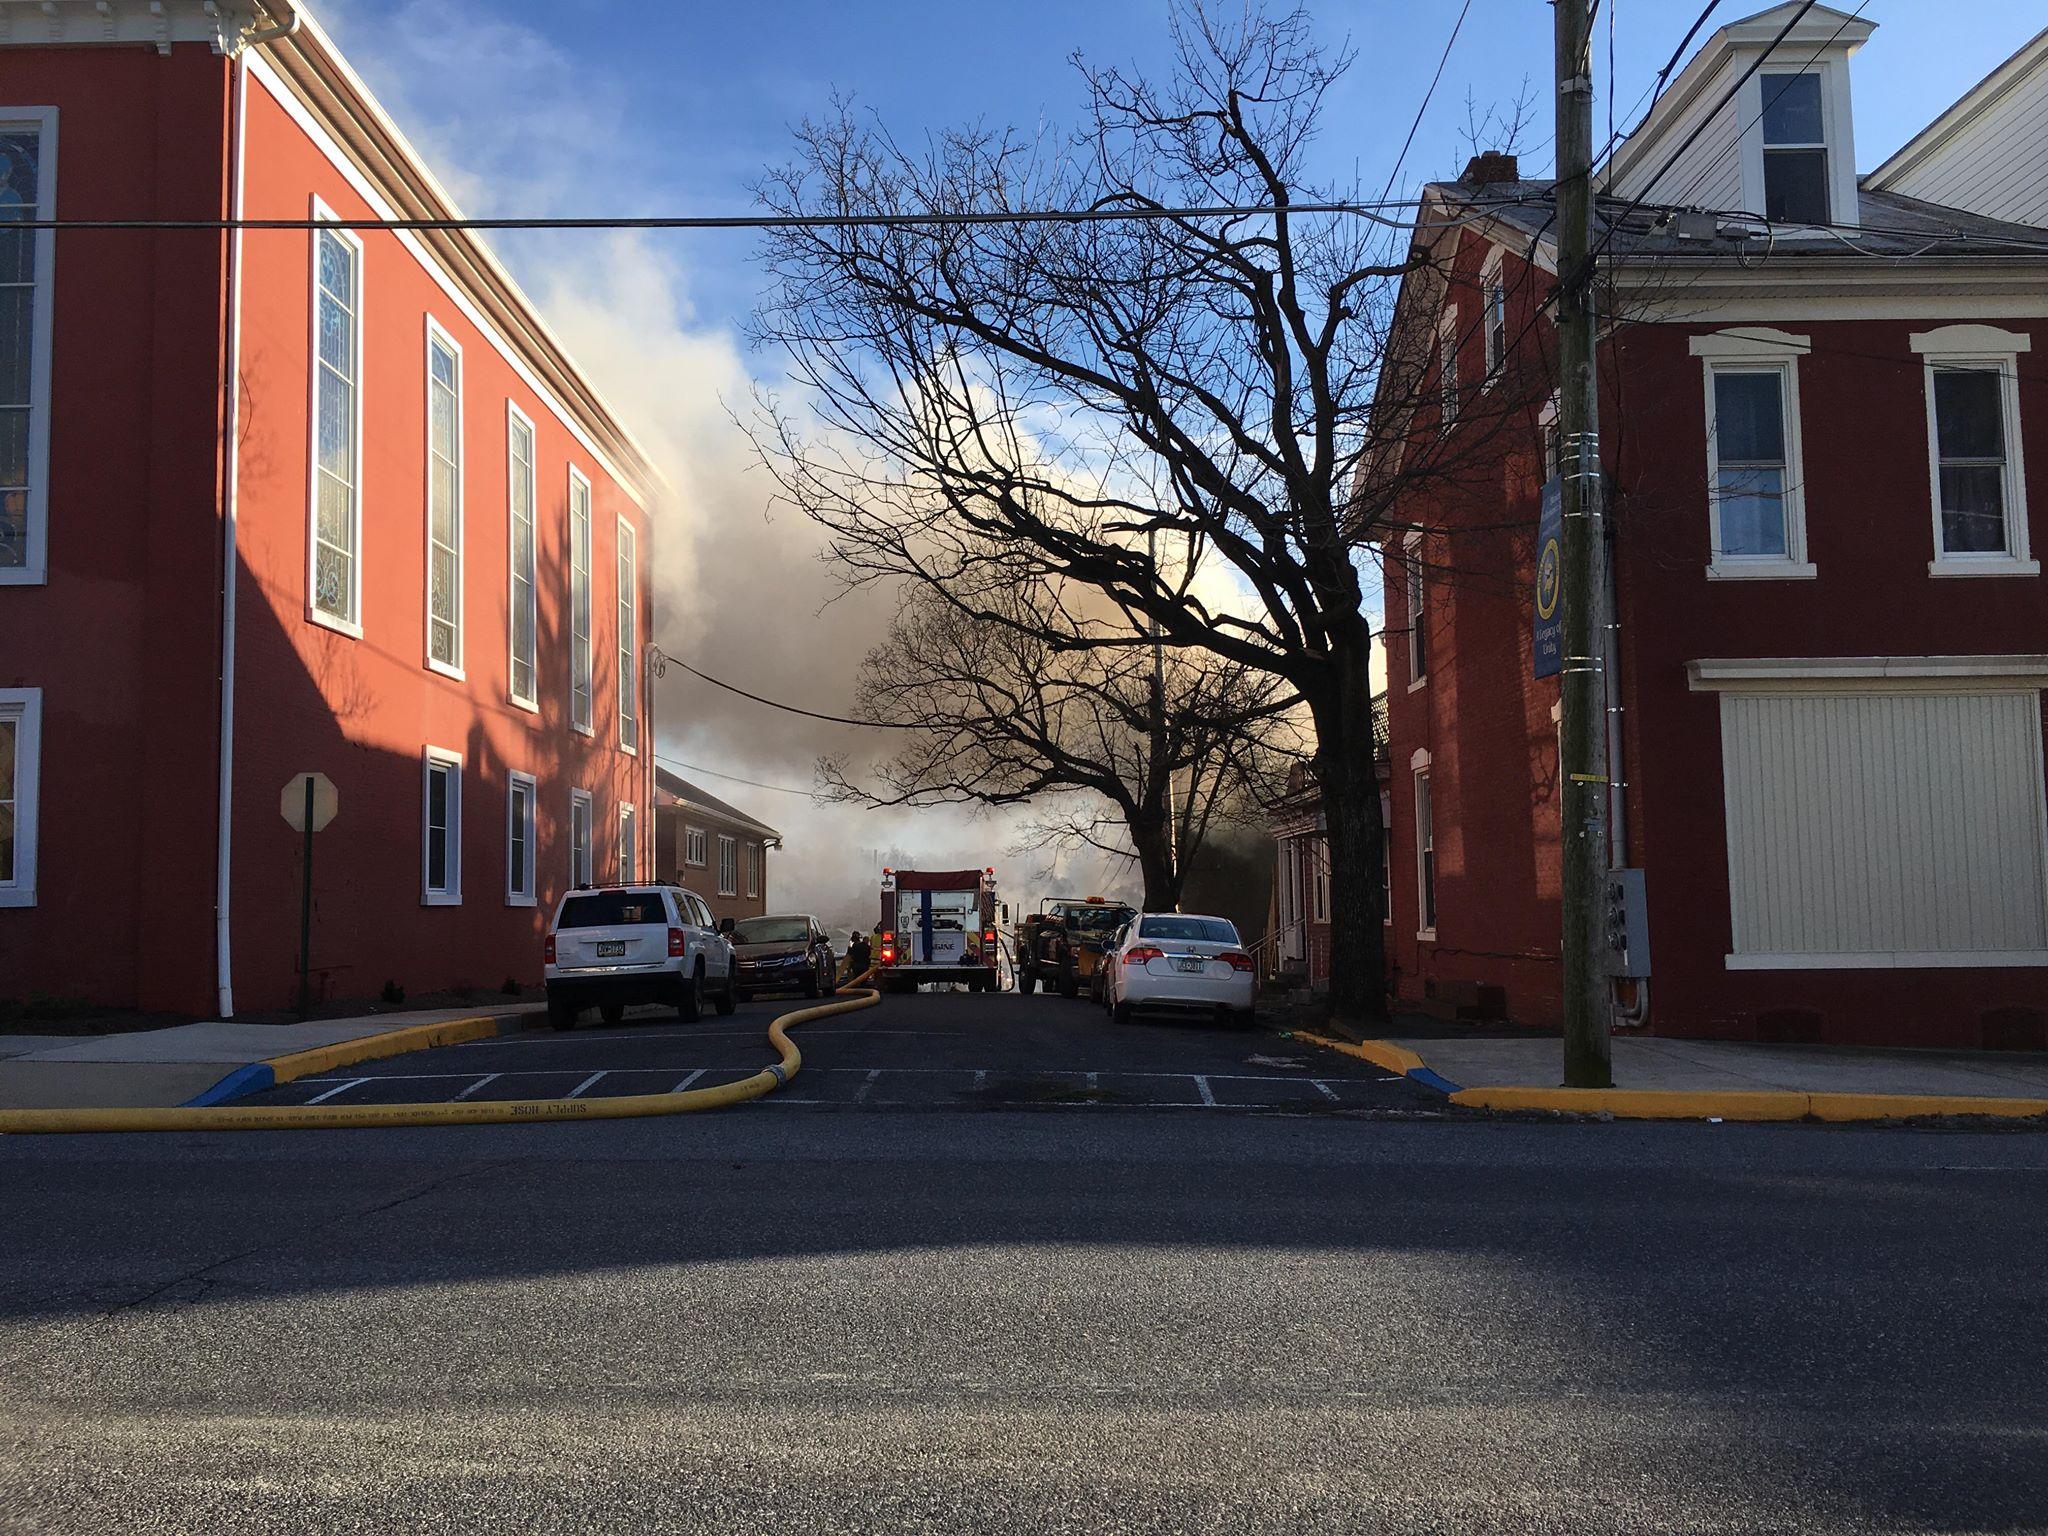 jonestown barn fire 2